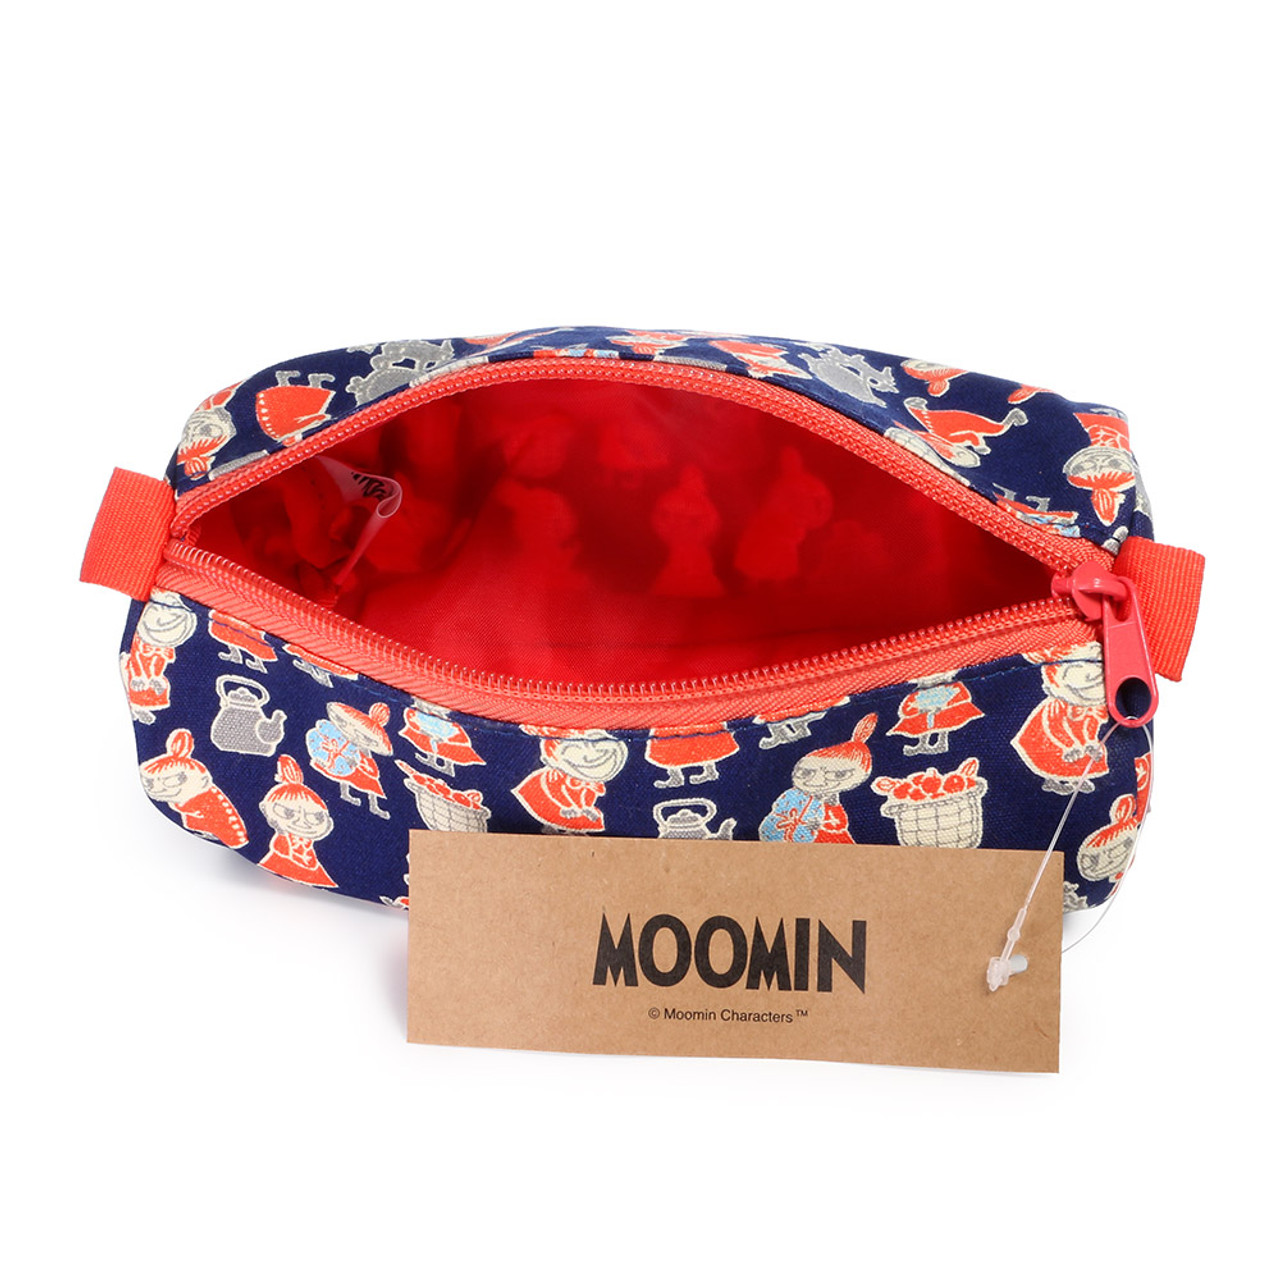 Moomin Canvas Barrel Pencil Case - Navy Blue  ( Inner View )